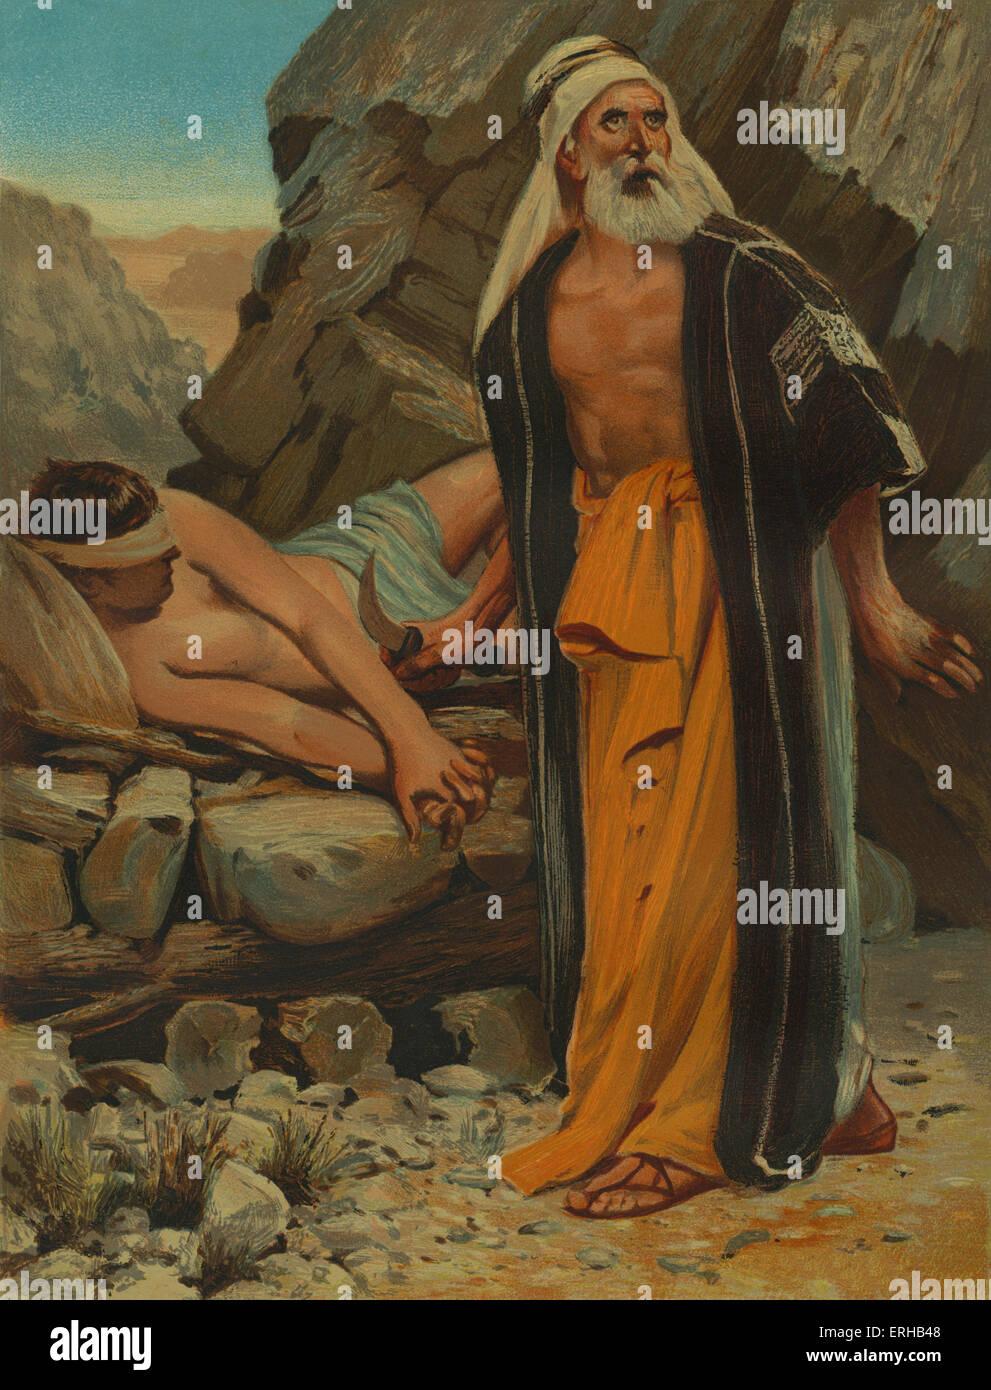 Abraham's sacrifice. Abraham prepares to offer his son, Isaac, as a sacrifice to God on Mount Moriah (Genesis:22). - Stock Image